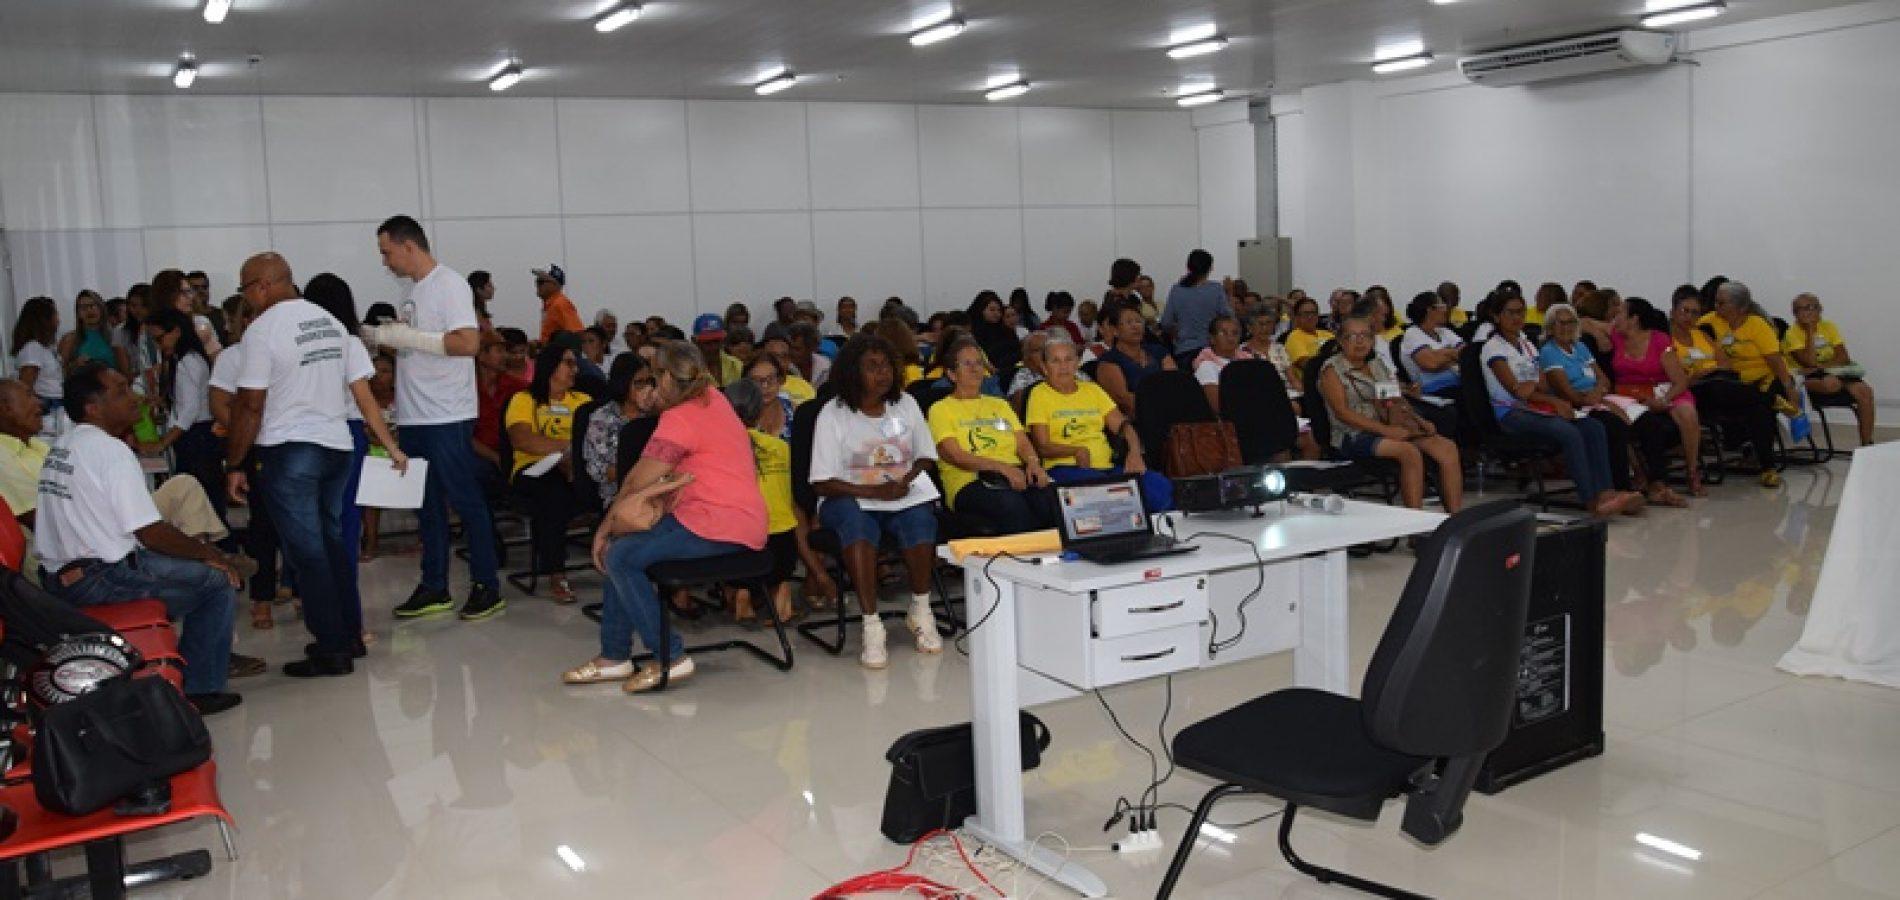 PICOS | III Conferência Municipal dos Idosos surpreende organizadores com número de participantes